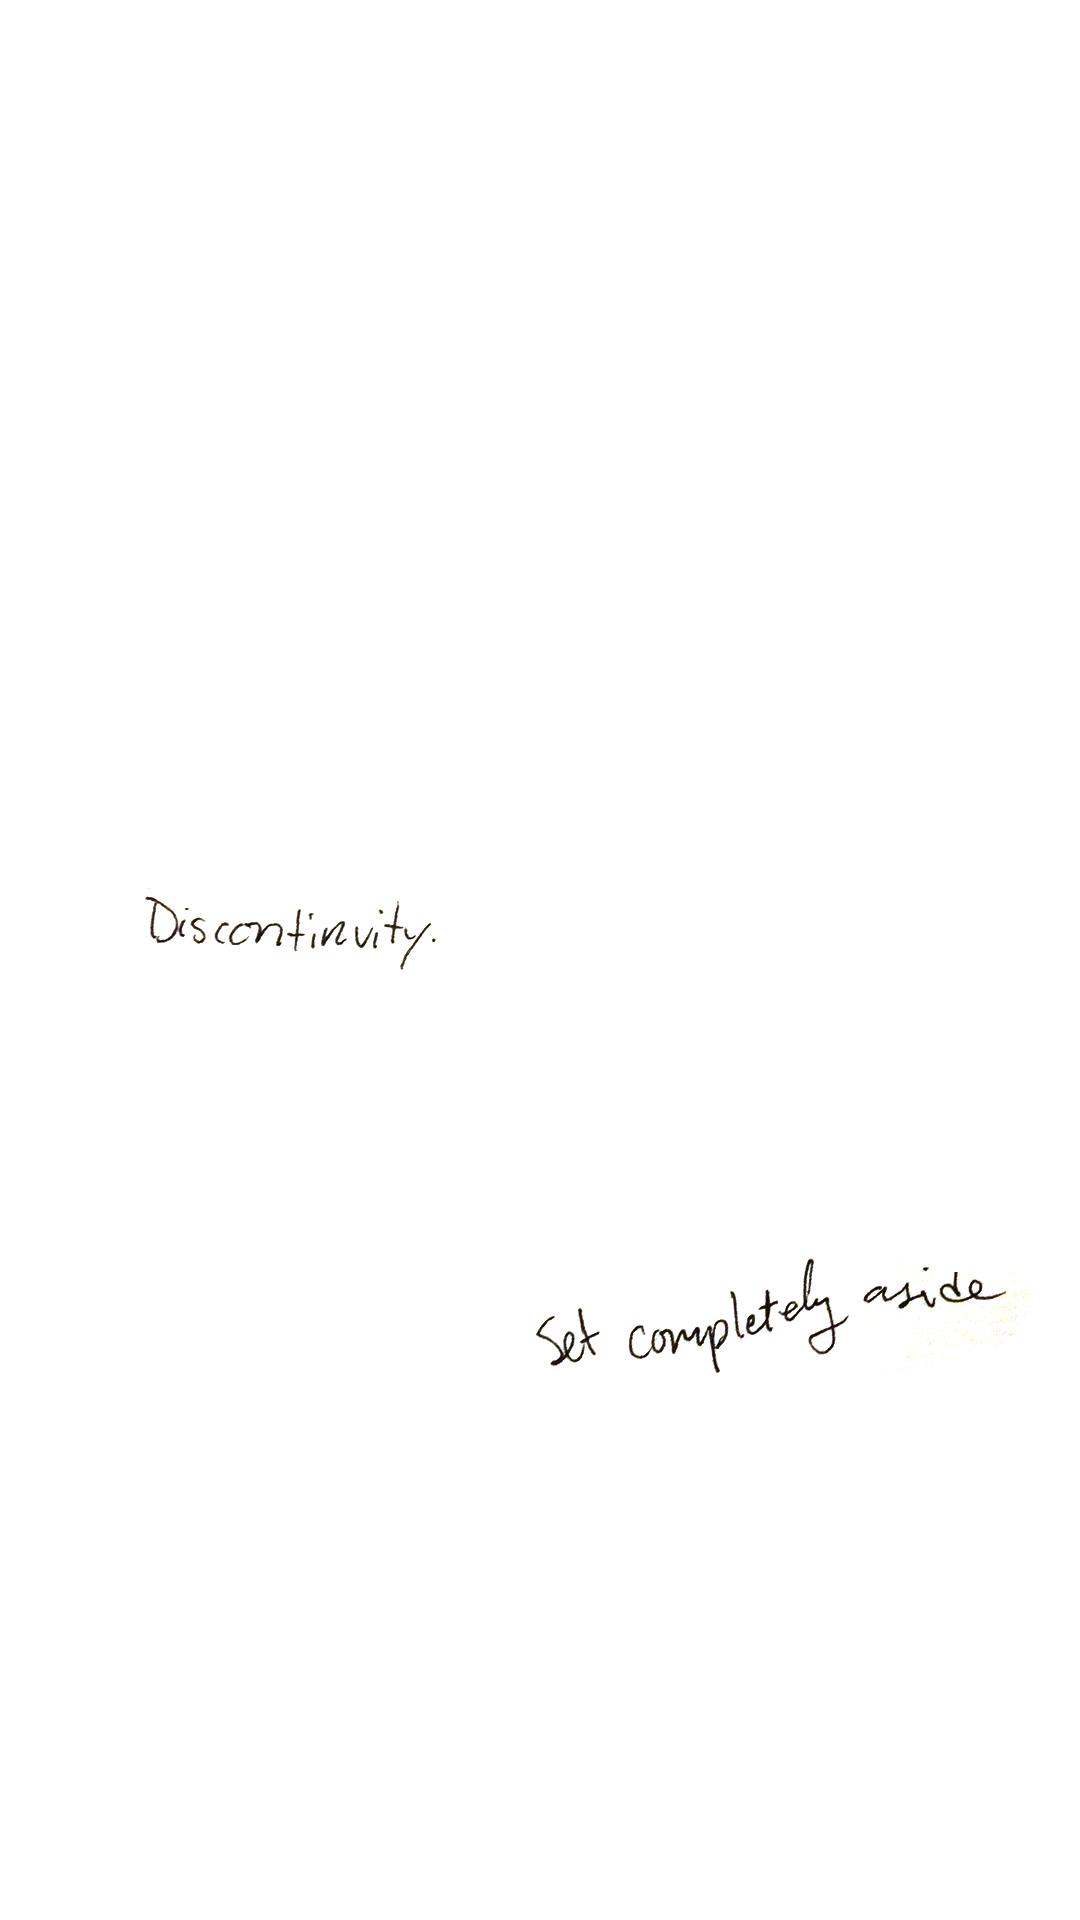 discontinuity.jpg